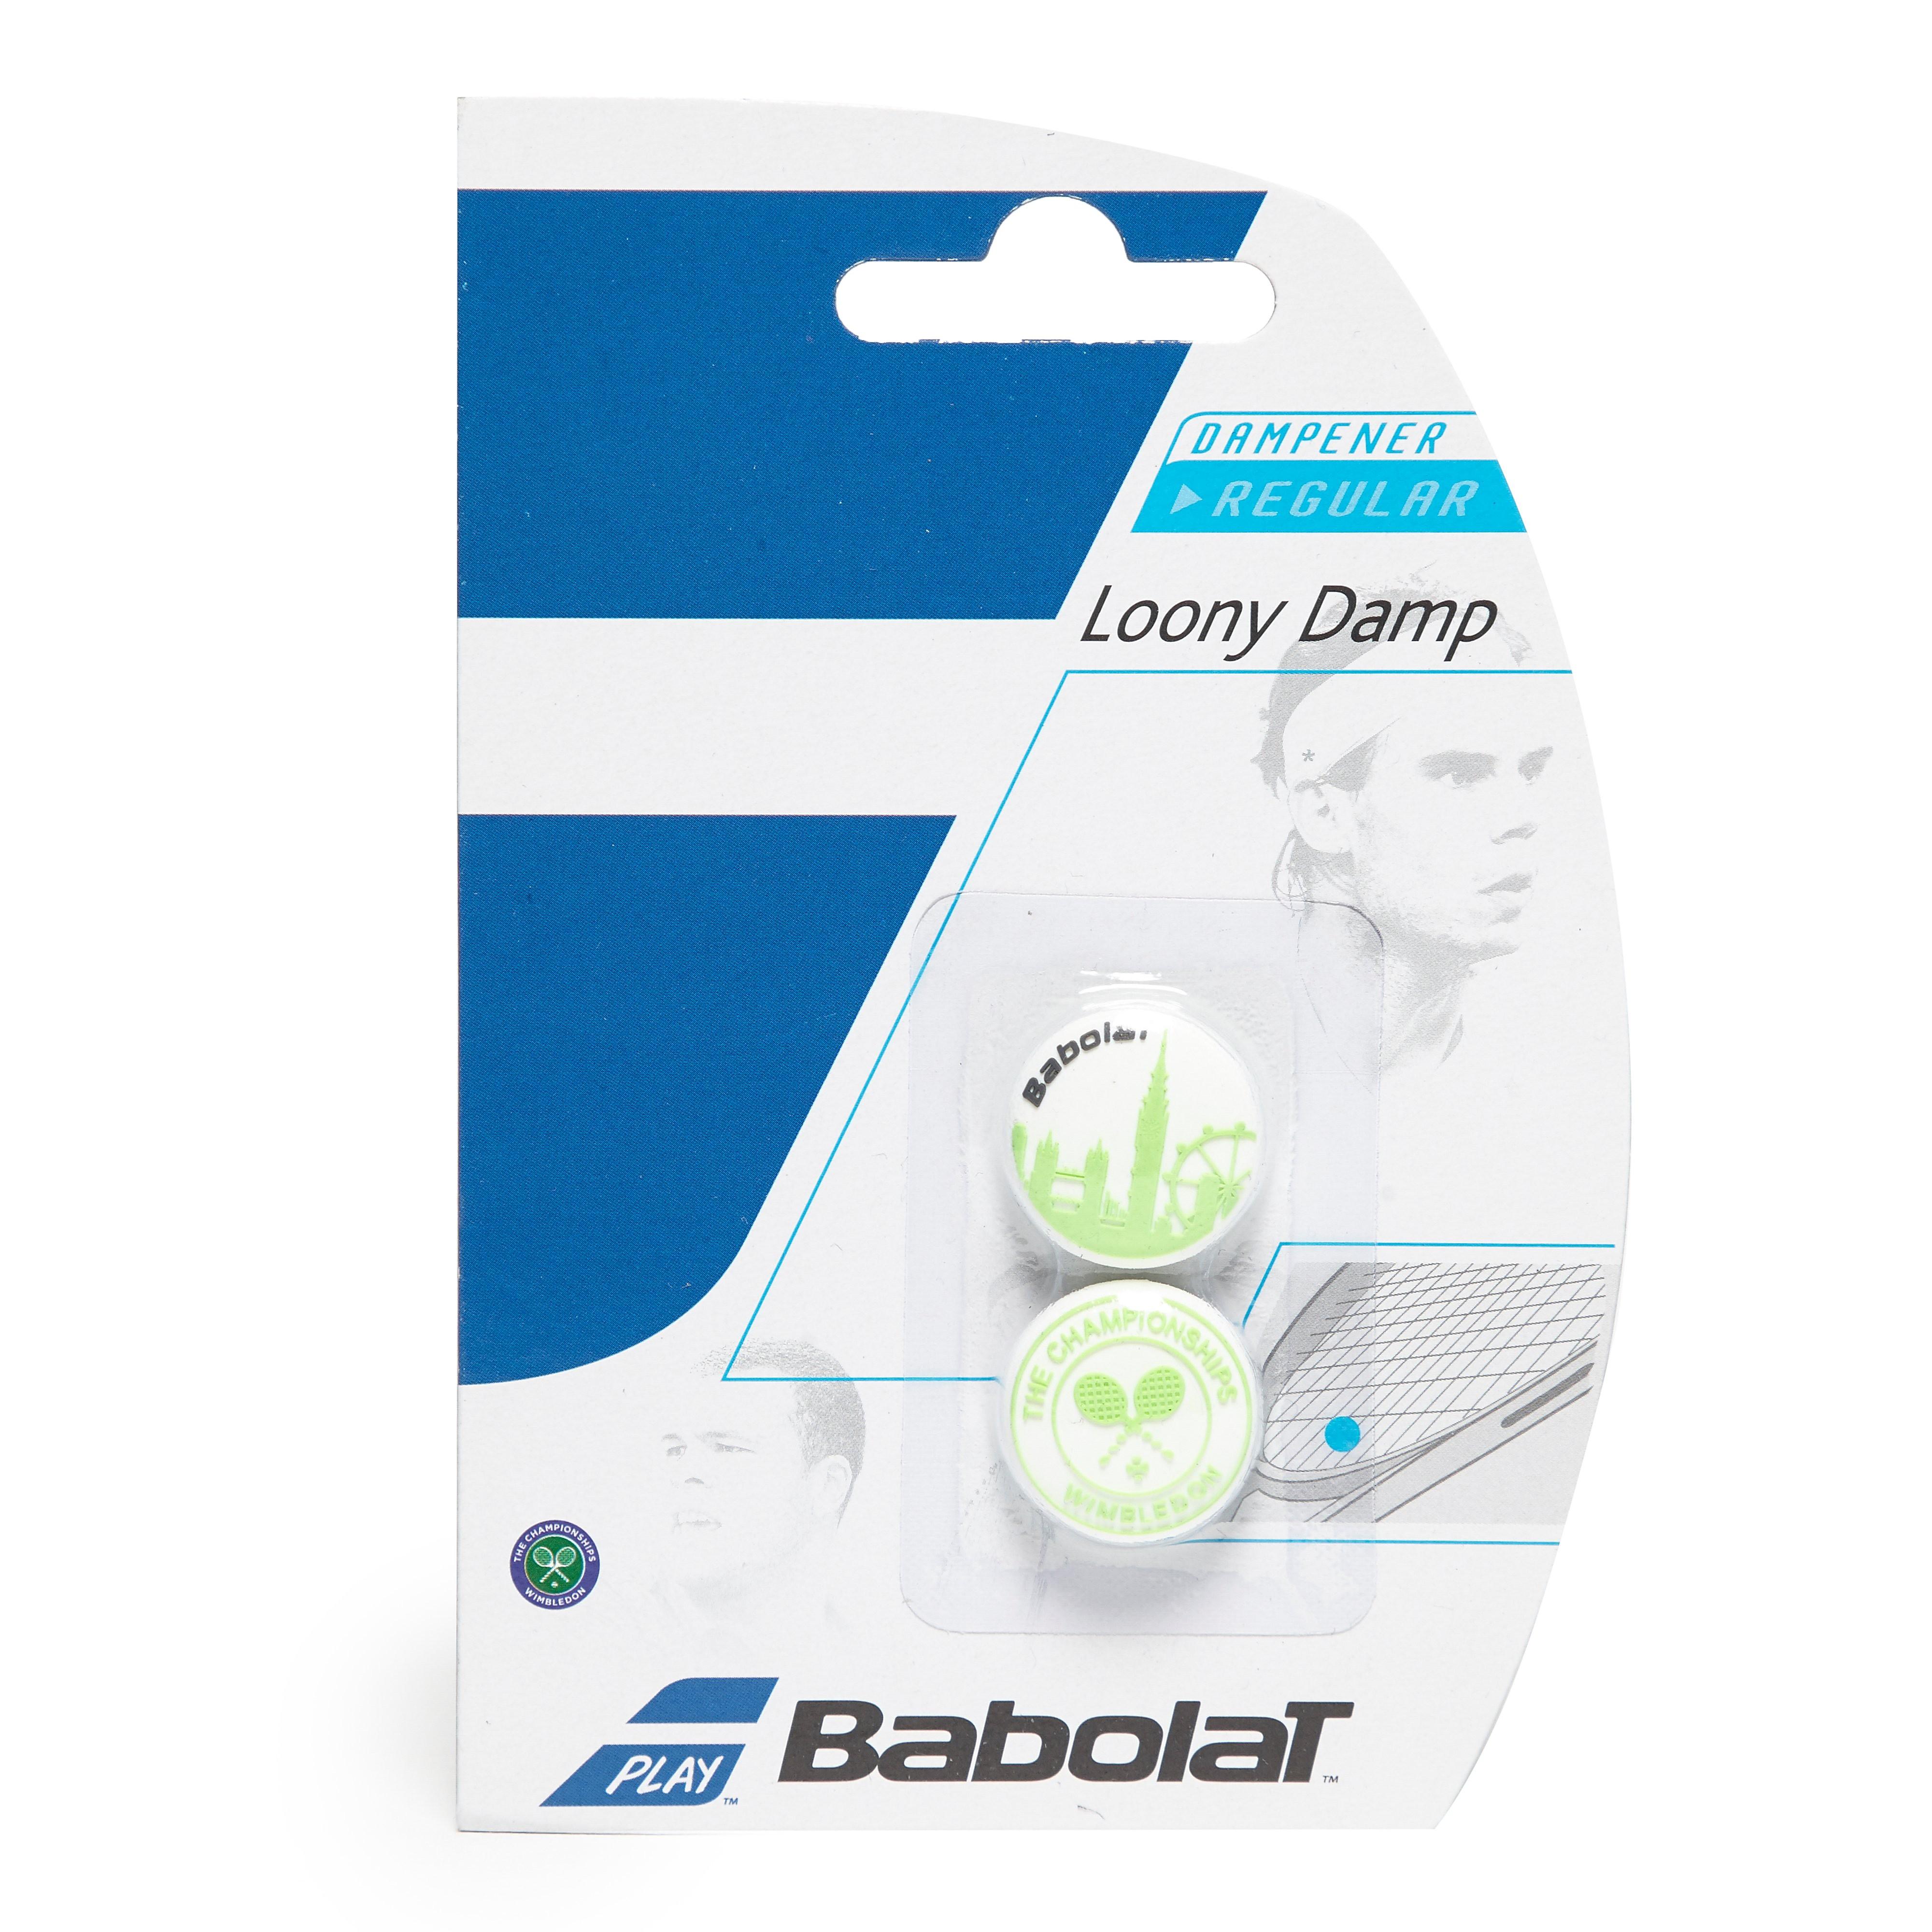 Babolat The Wimbledon Championships Loony Dampener